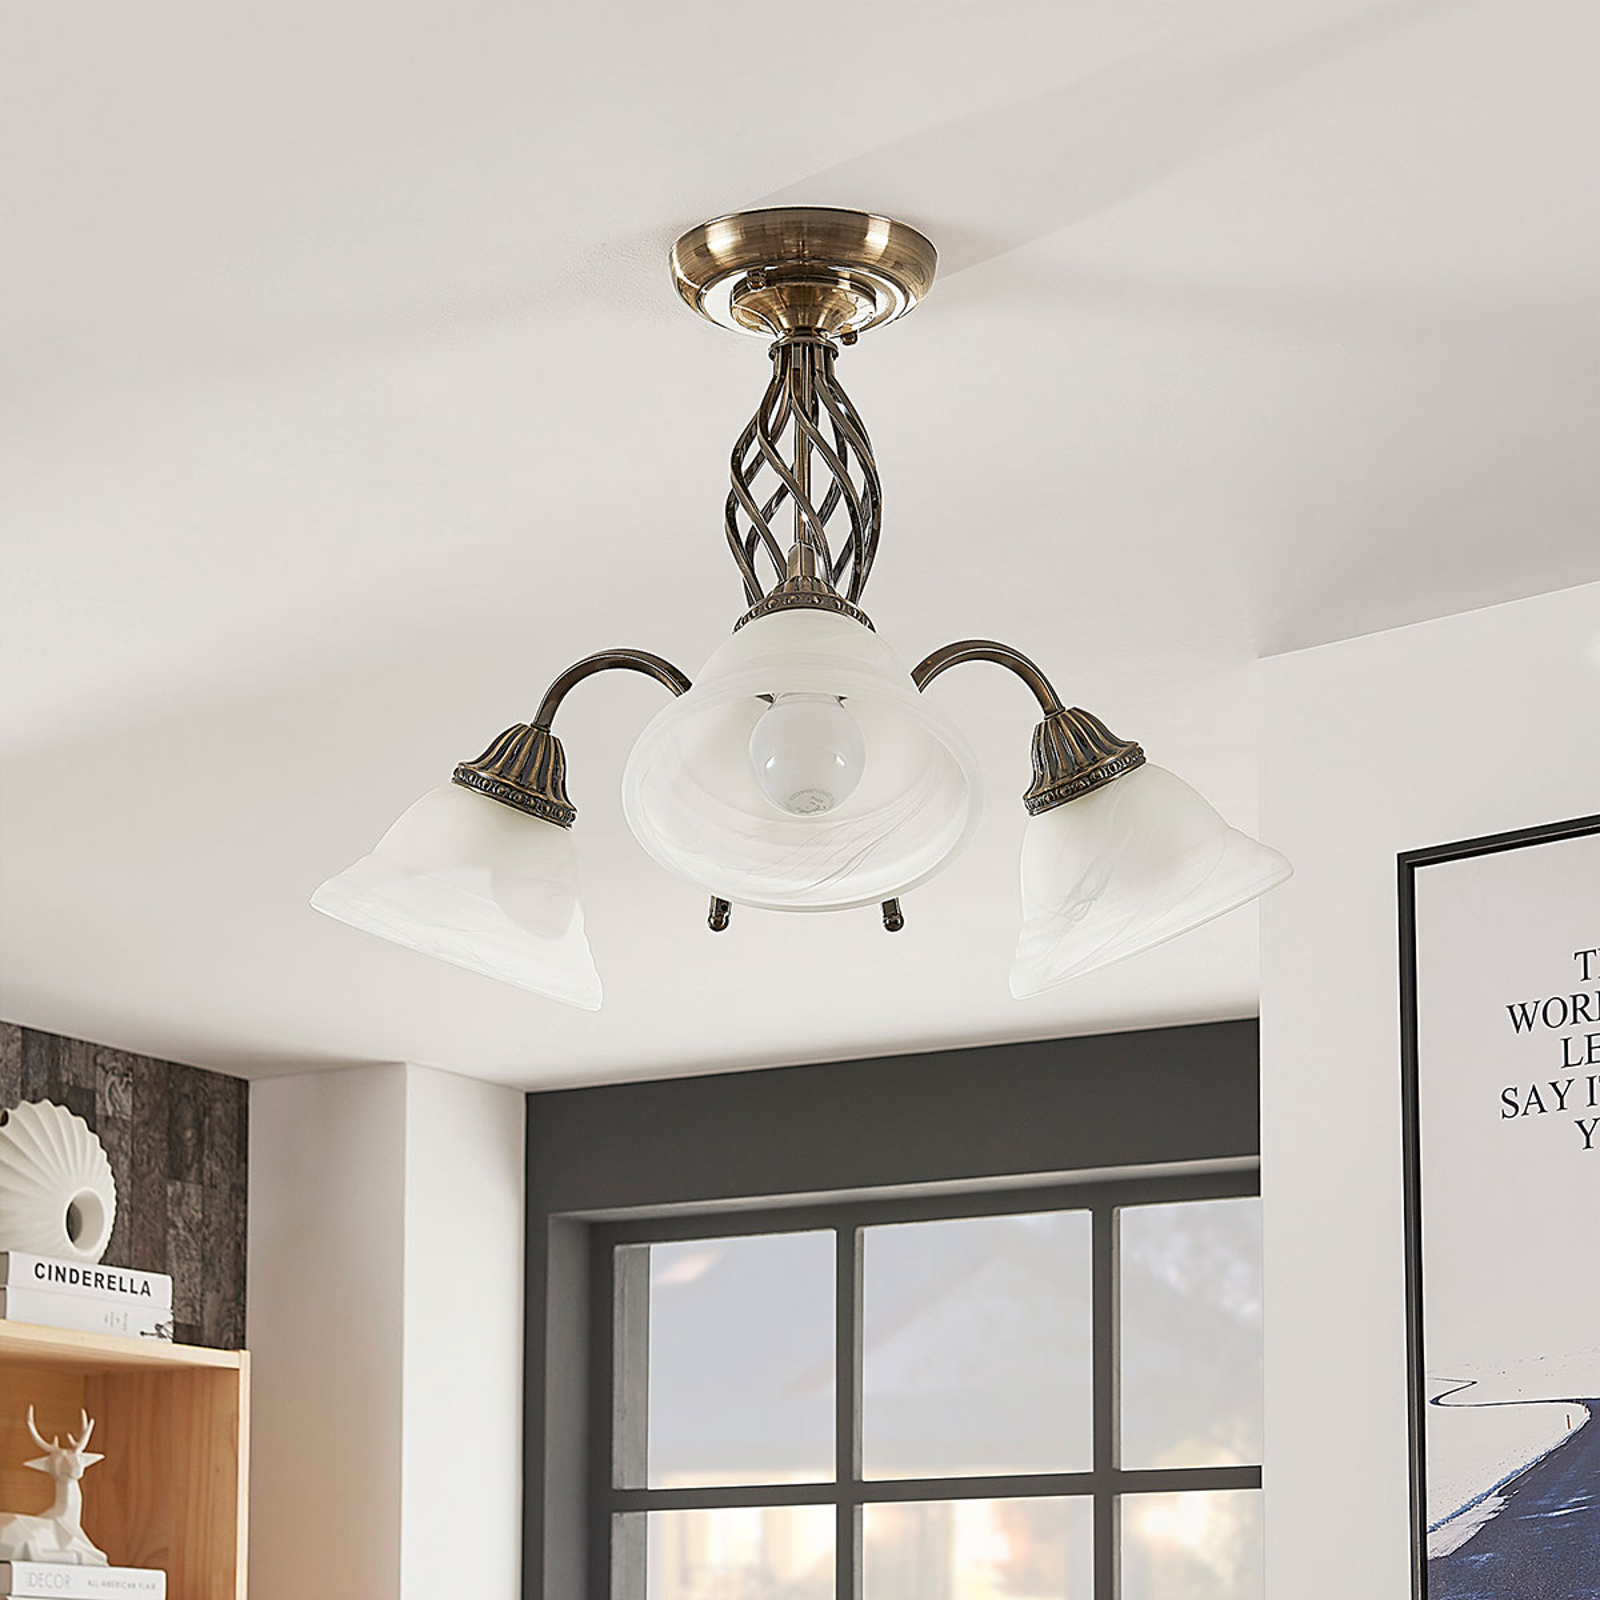 3 Bulb Ceiling Light Mialina Lights Co Uk